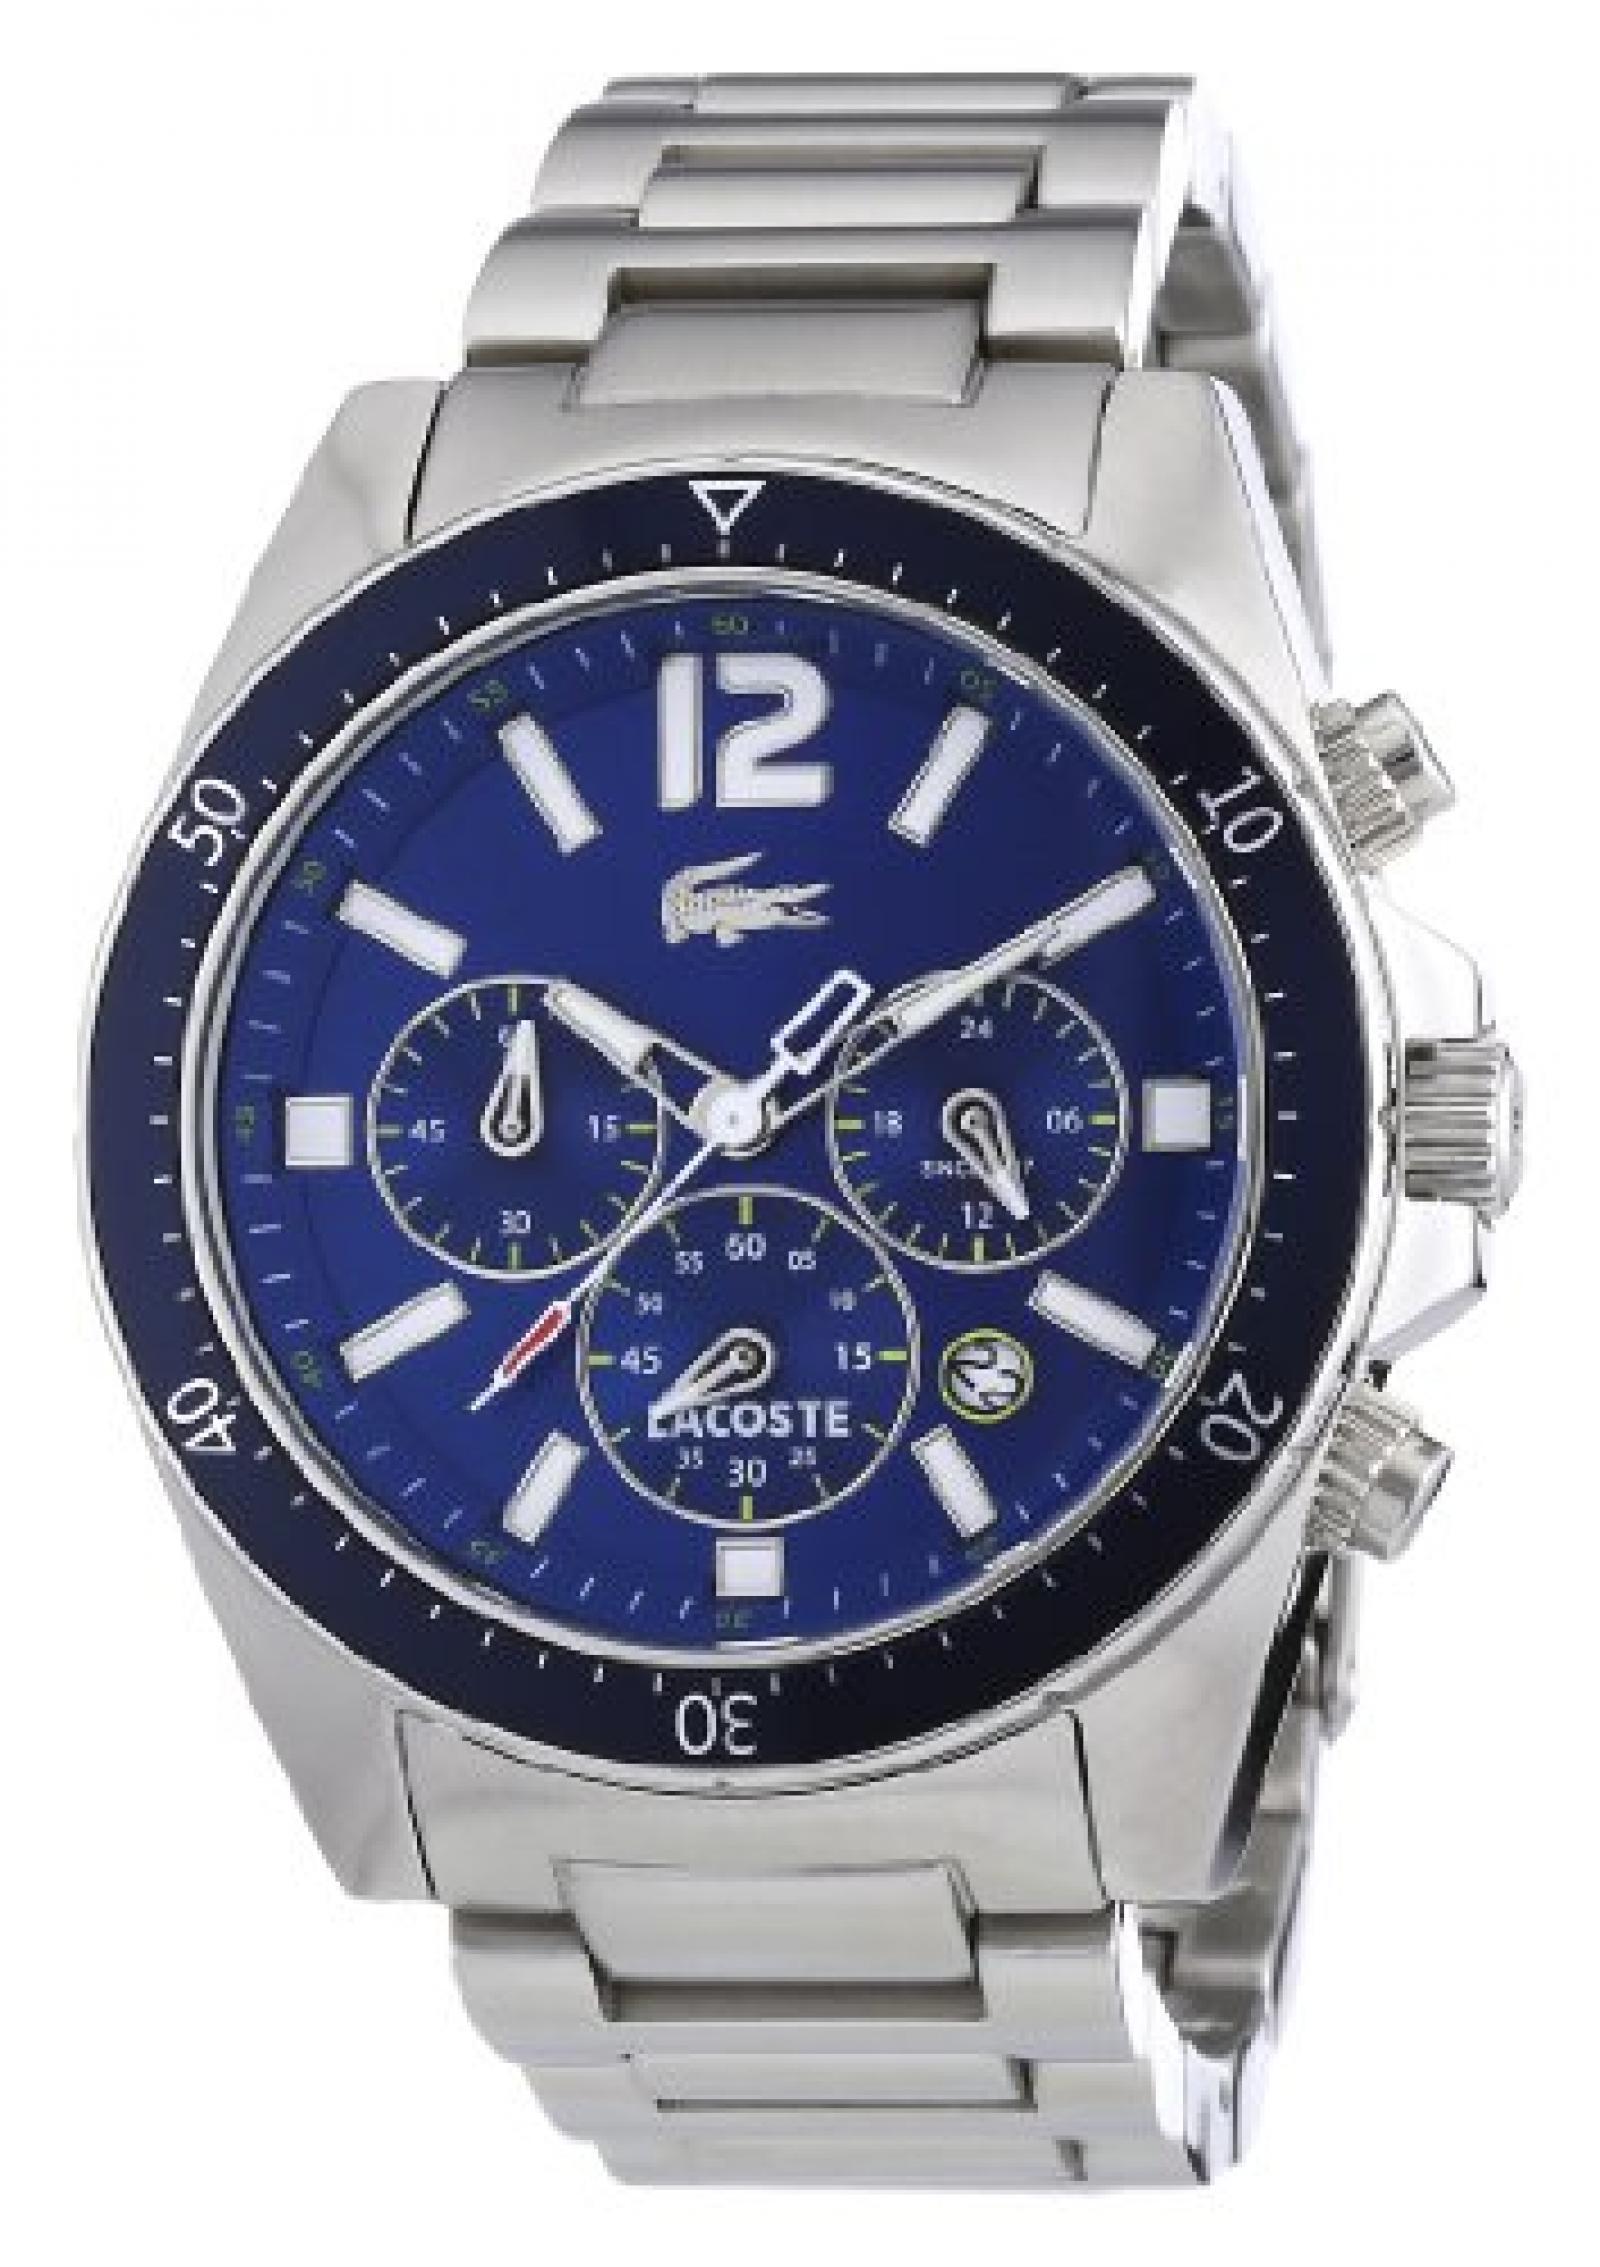 Lacoste Herren-Armbanduhr XL Analog Quarz Edelstahl 2010641